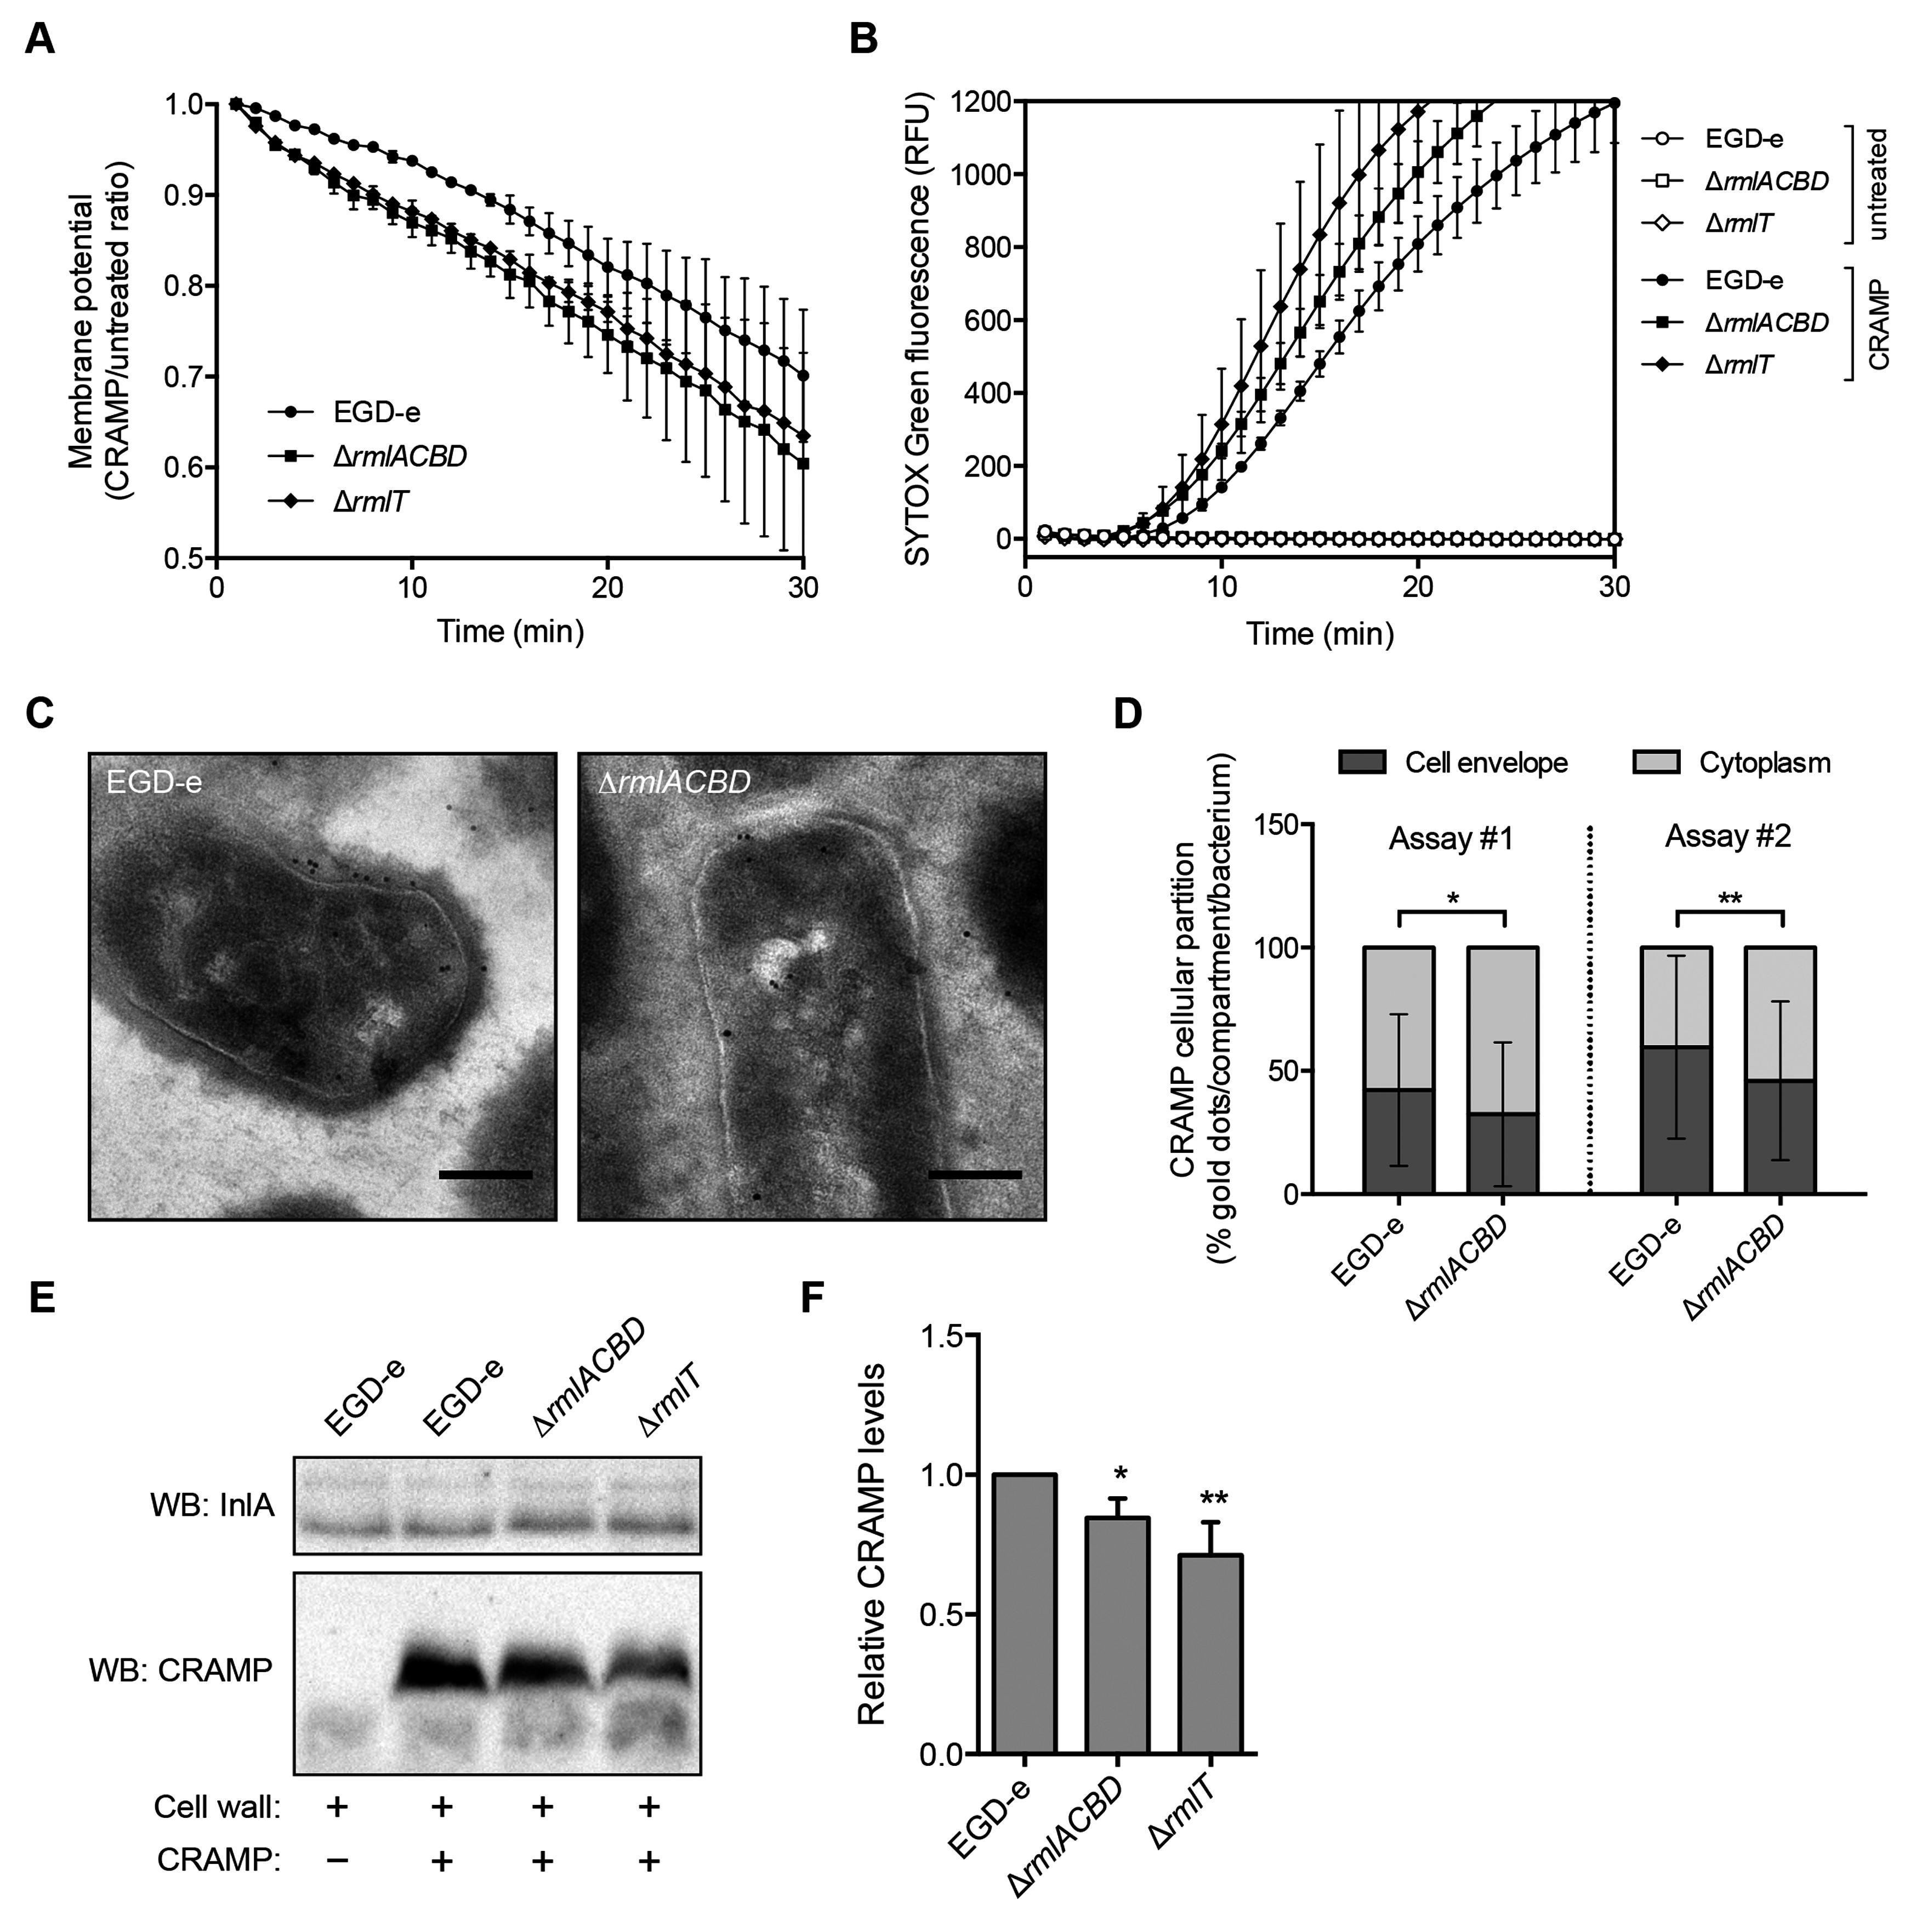 WTA l-rhamnosylation delays AMP interaction with the <i>Lm</i> plasma membrane.